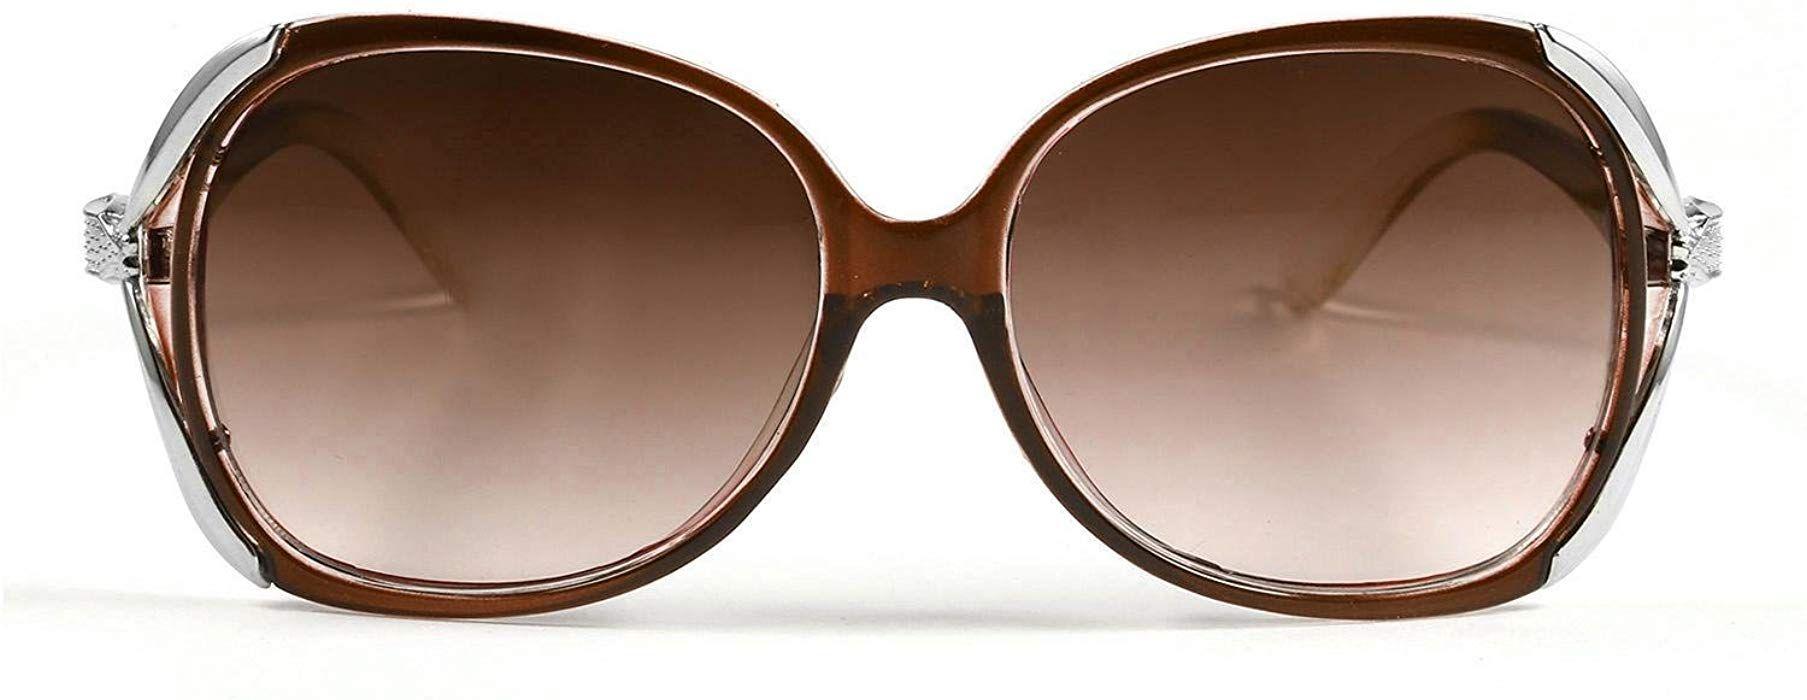 24bc47e91df3 Amazon.com  Bulges New Women Fashion Sunglasses Eyewear Vintage Style  Casual Round Shape Sunglasses(8 colors)  Clothing